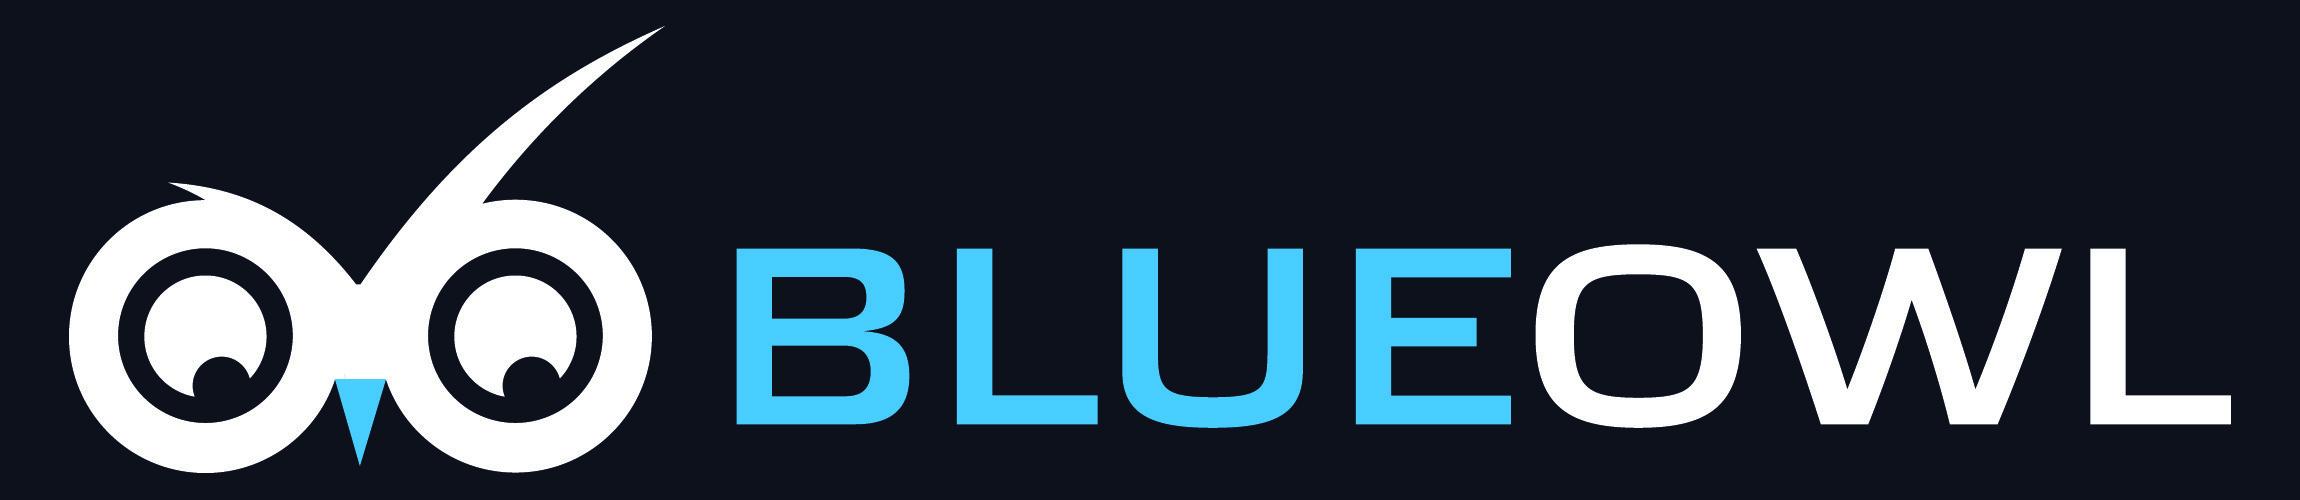 Blue Owl Logo dark